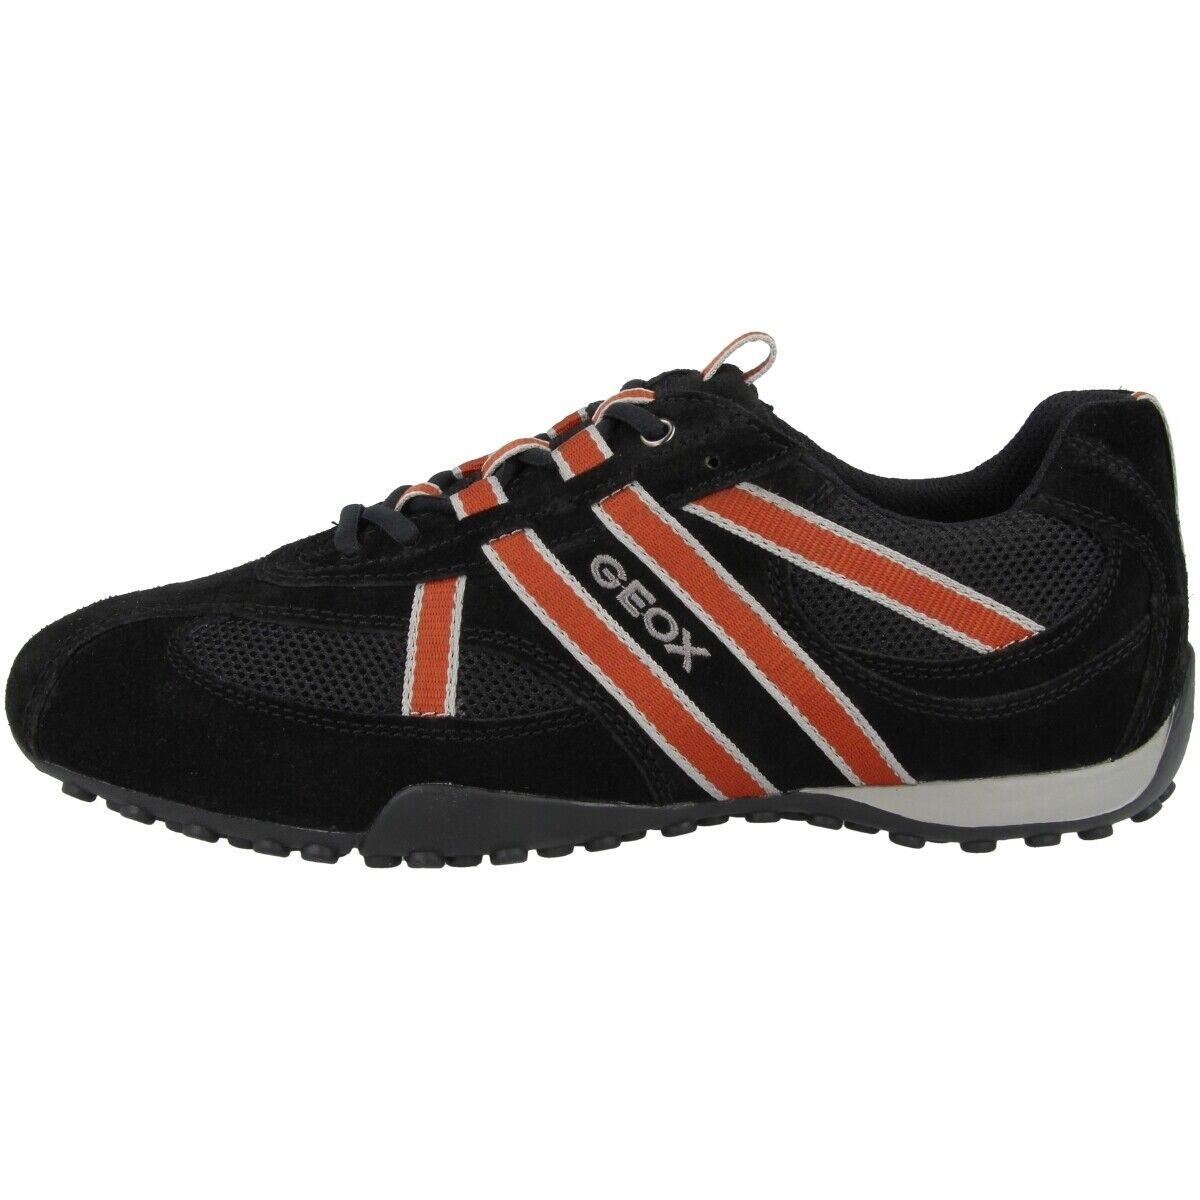 Geox u Snake s zapatos caballero casual zapatillas zapato bajo negro u2207sa2214c0038